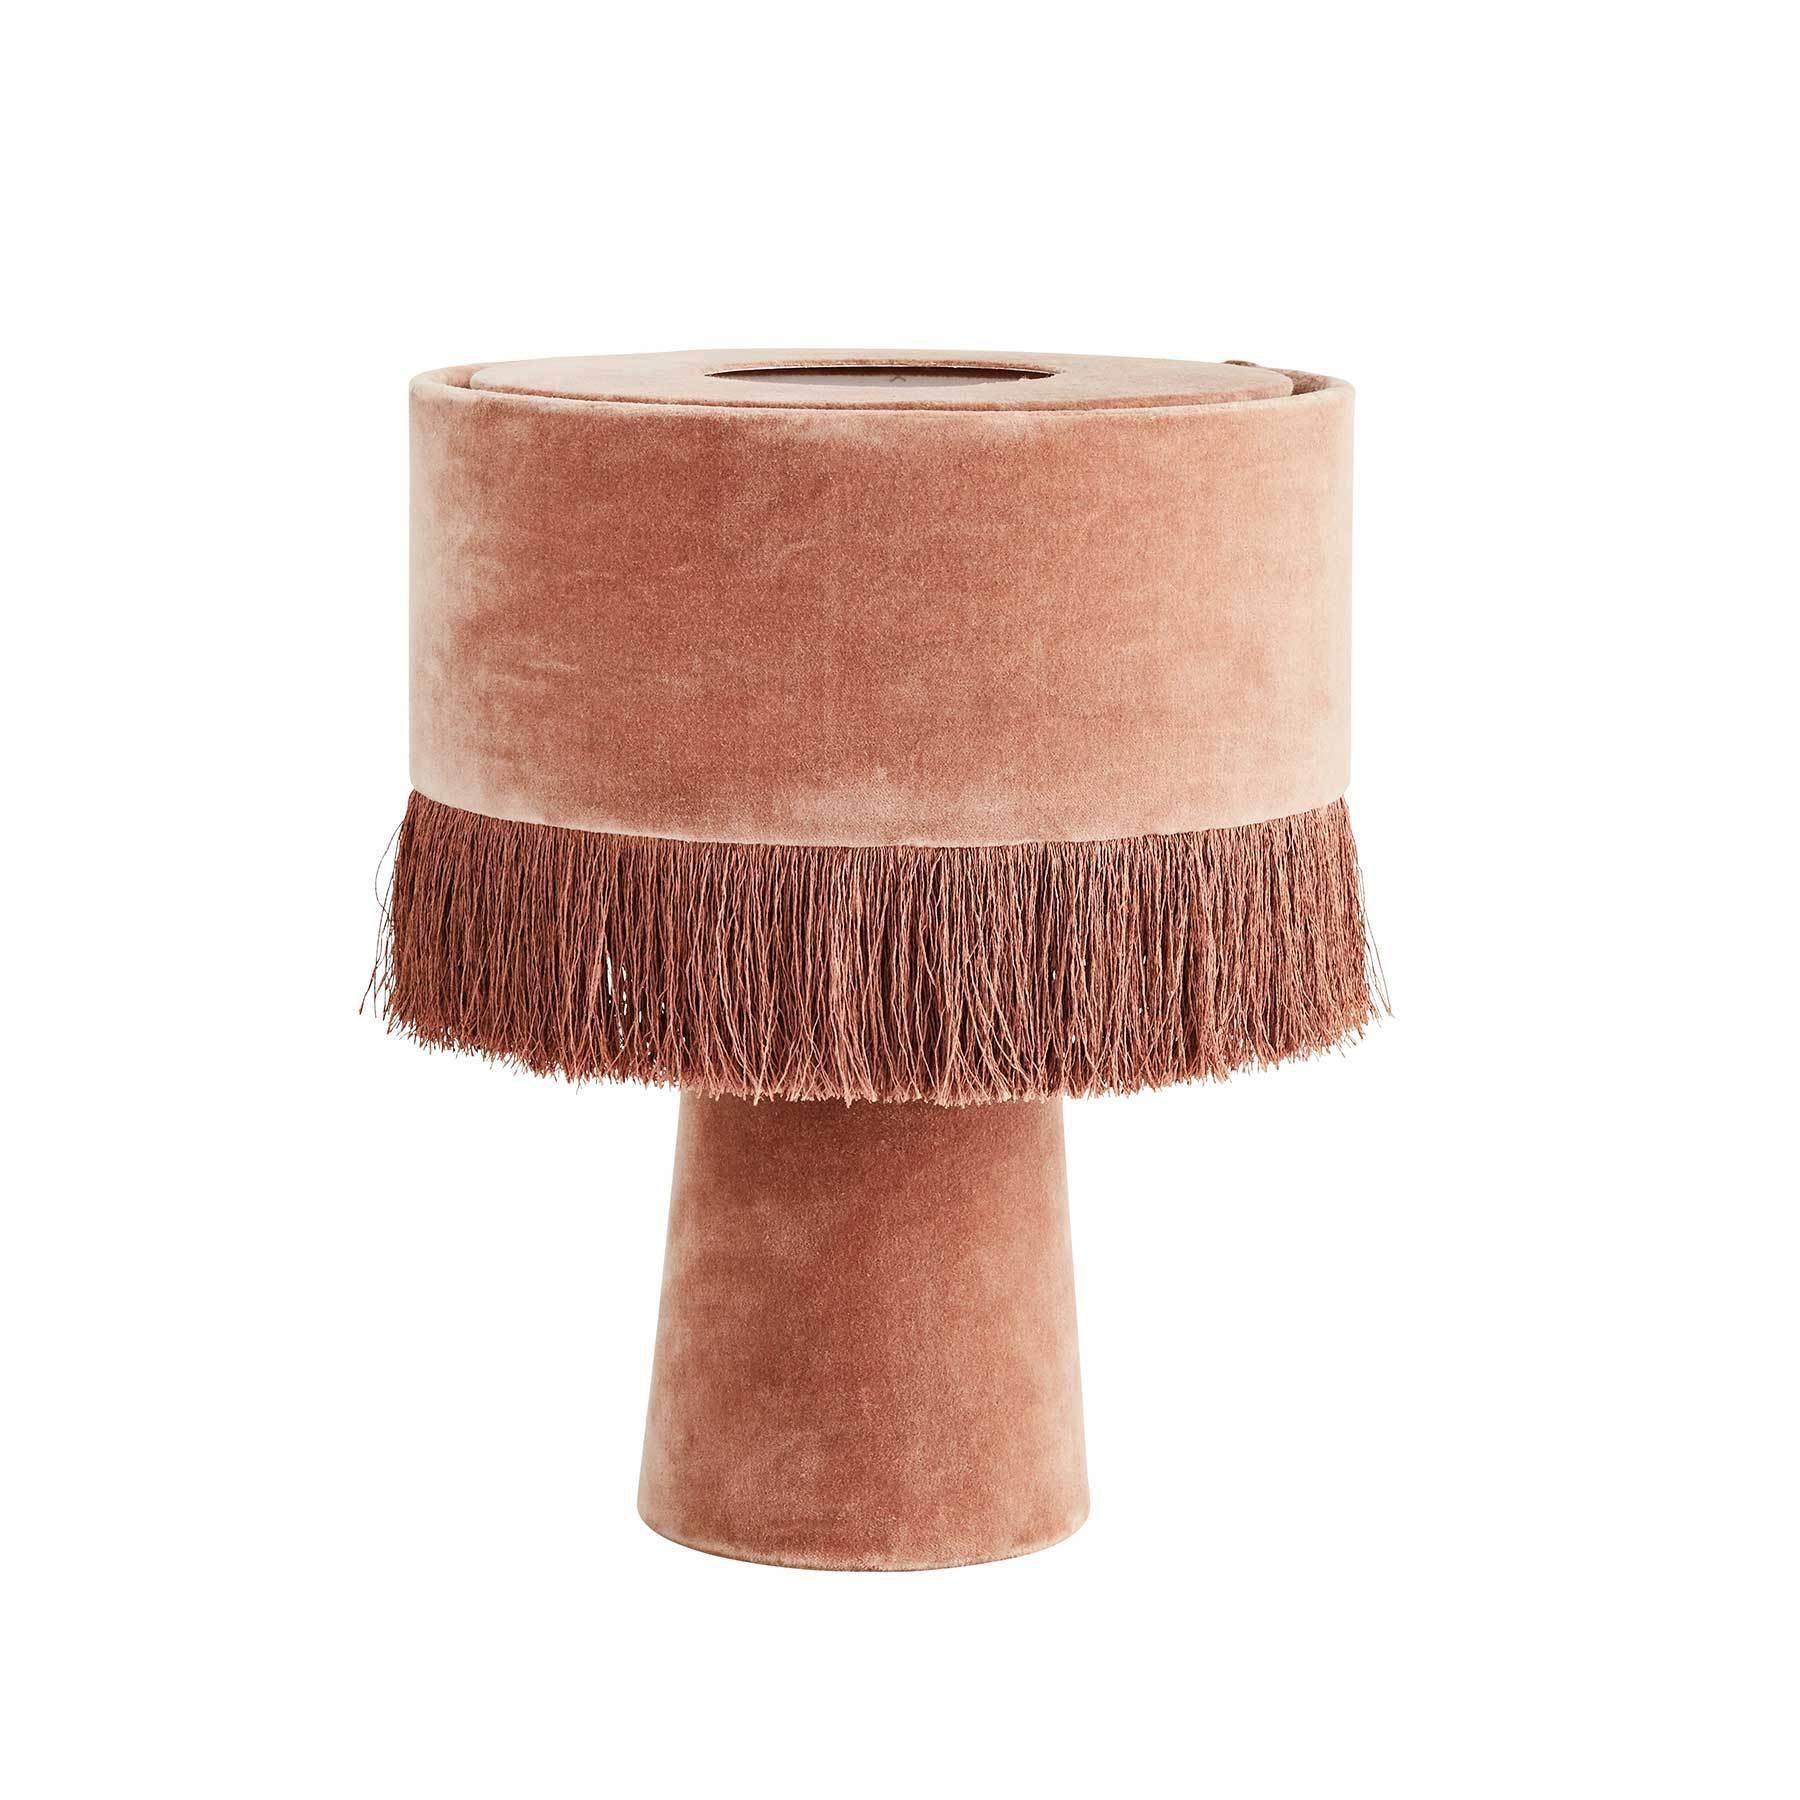 image-MARAIS TABLE LAMP IN ROSE